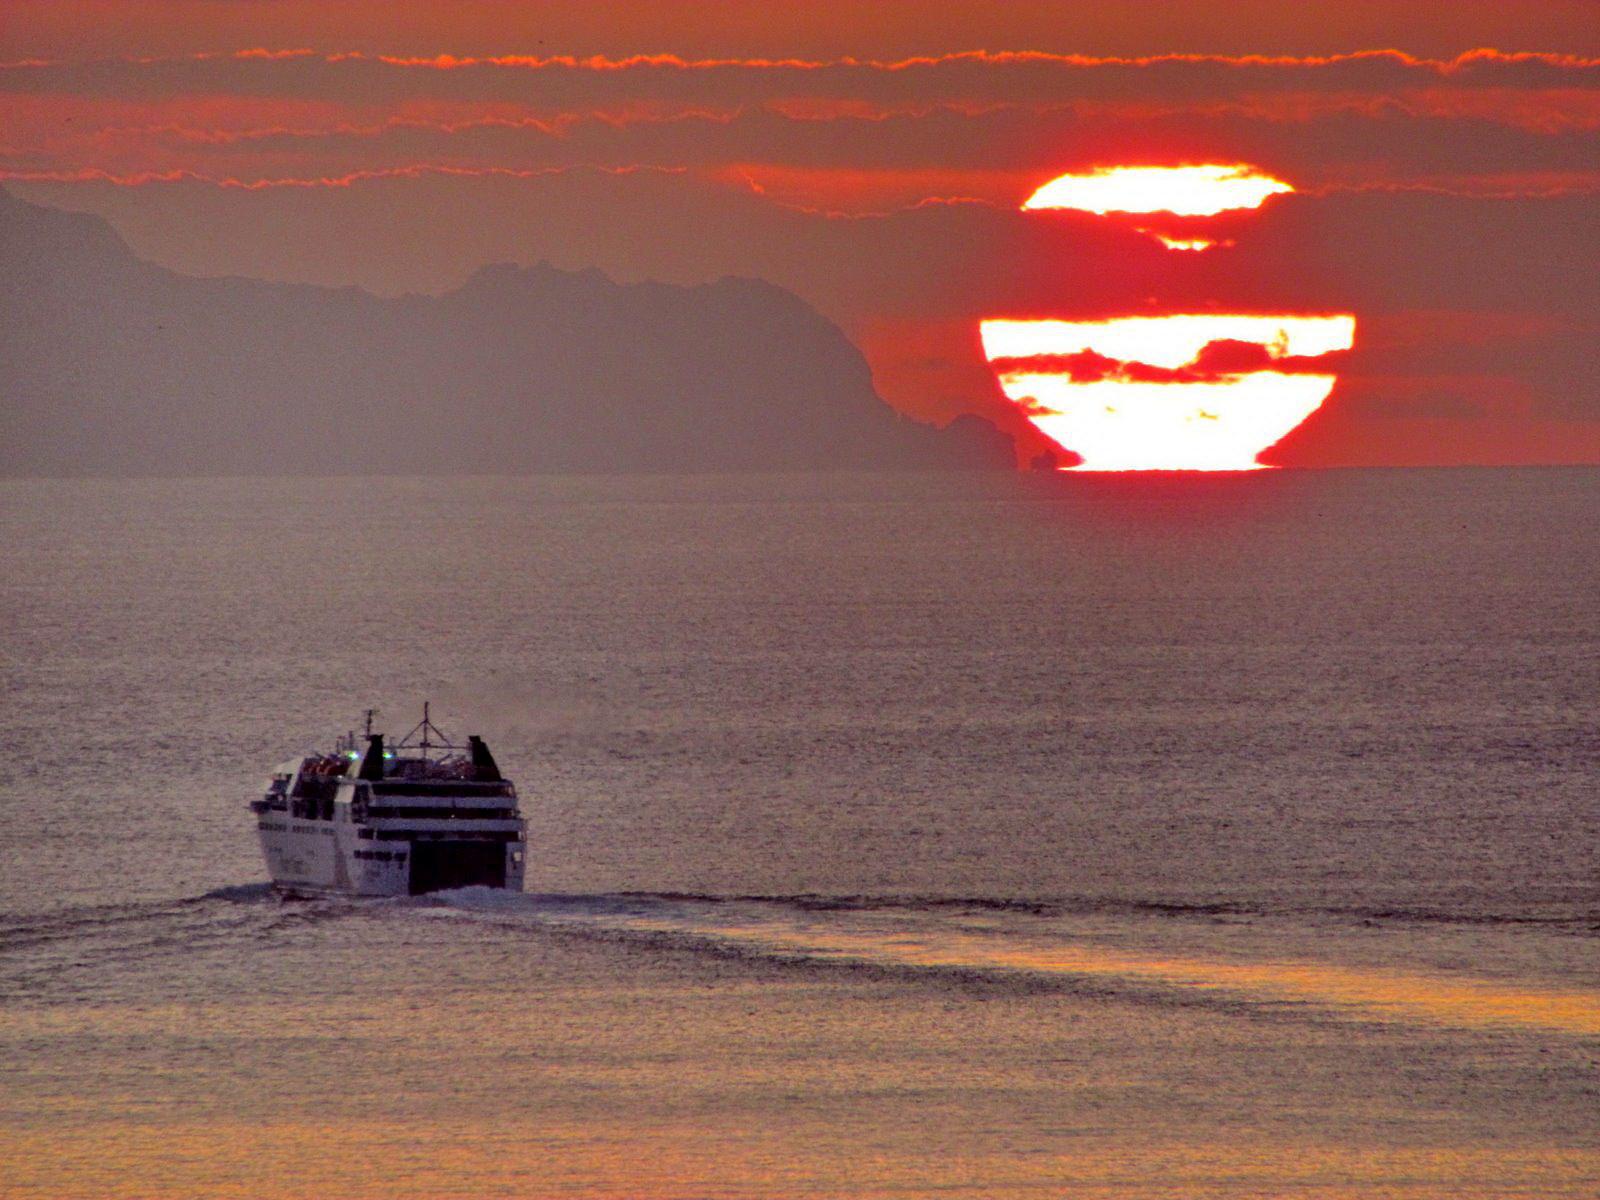 Lobo Marinho and the sun